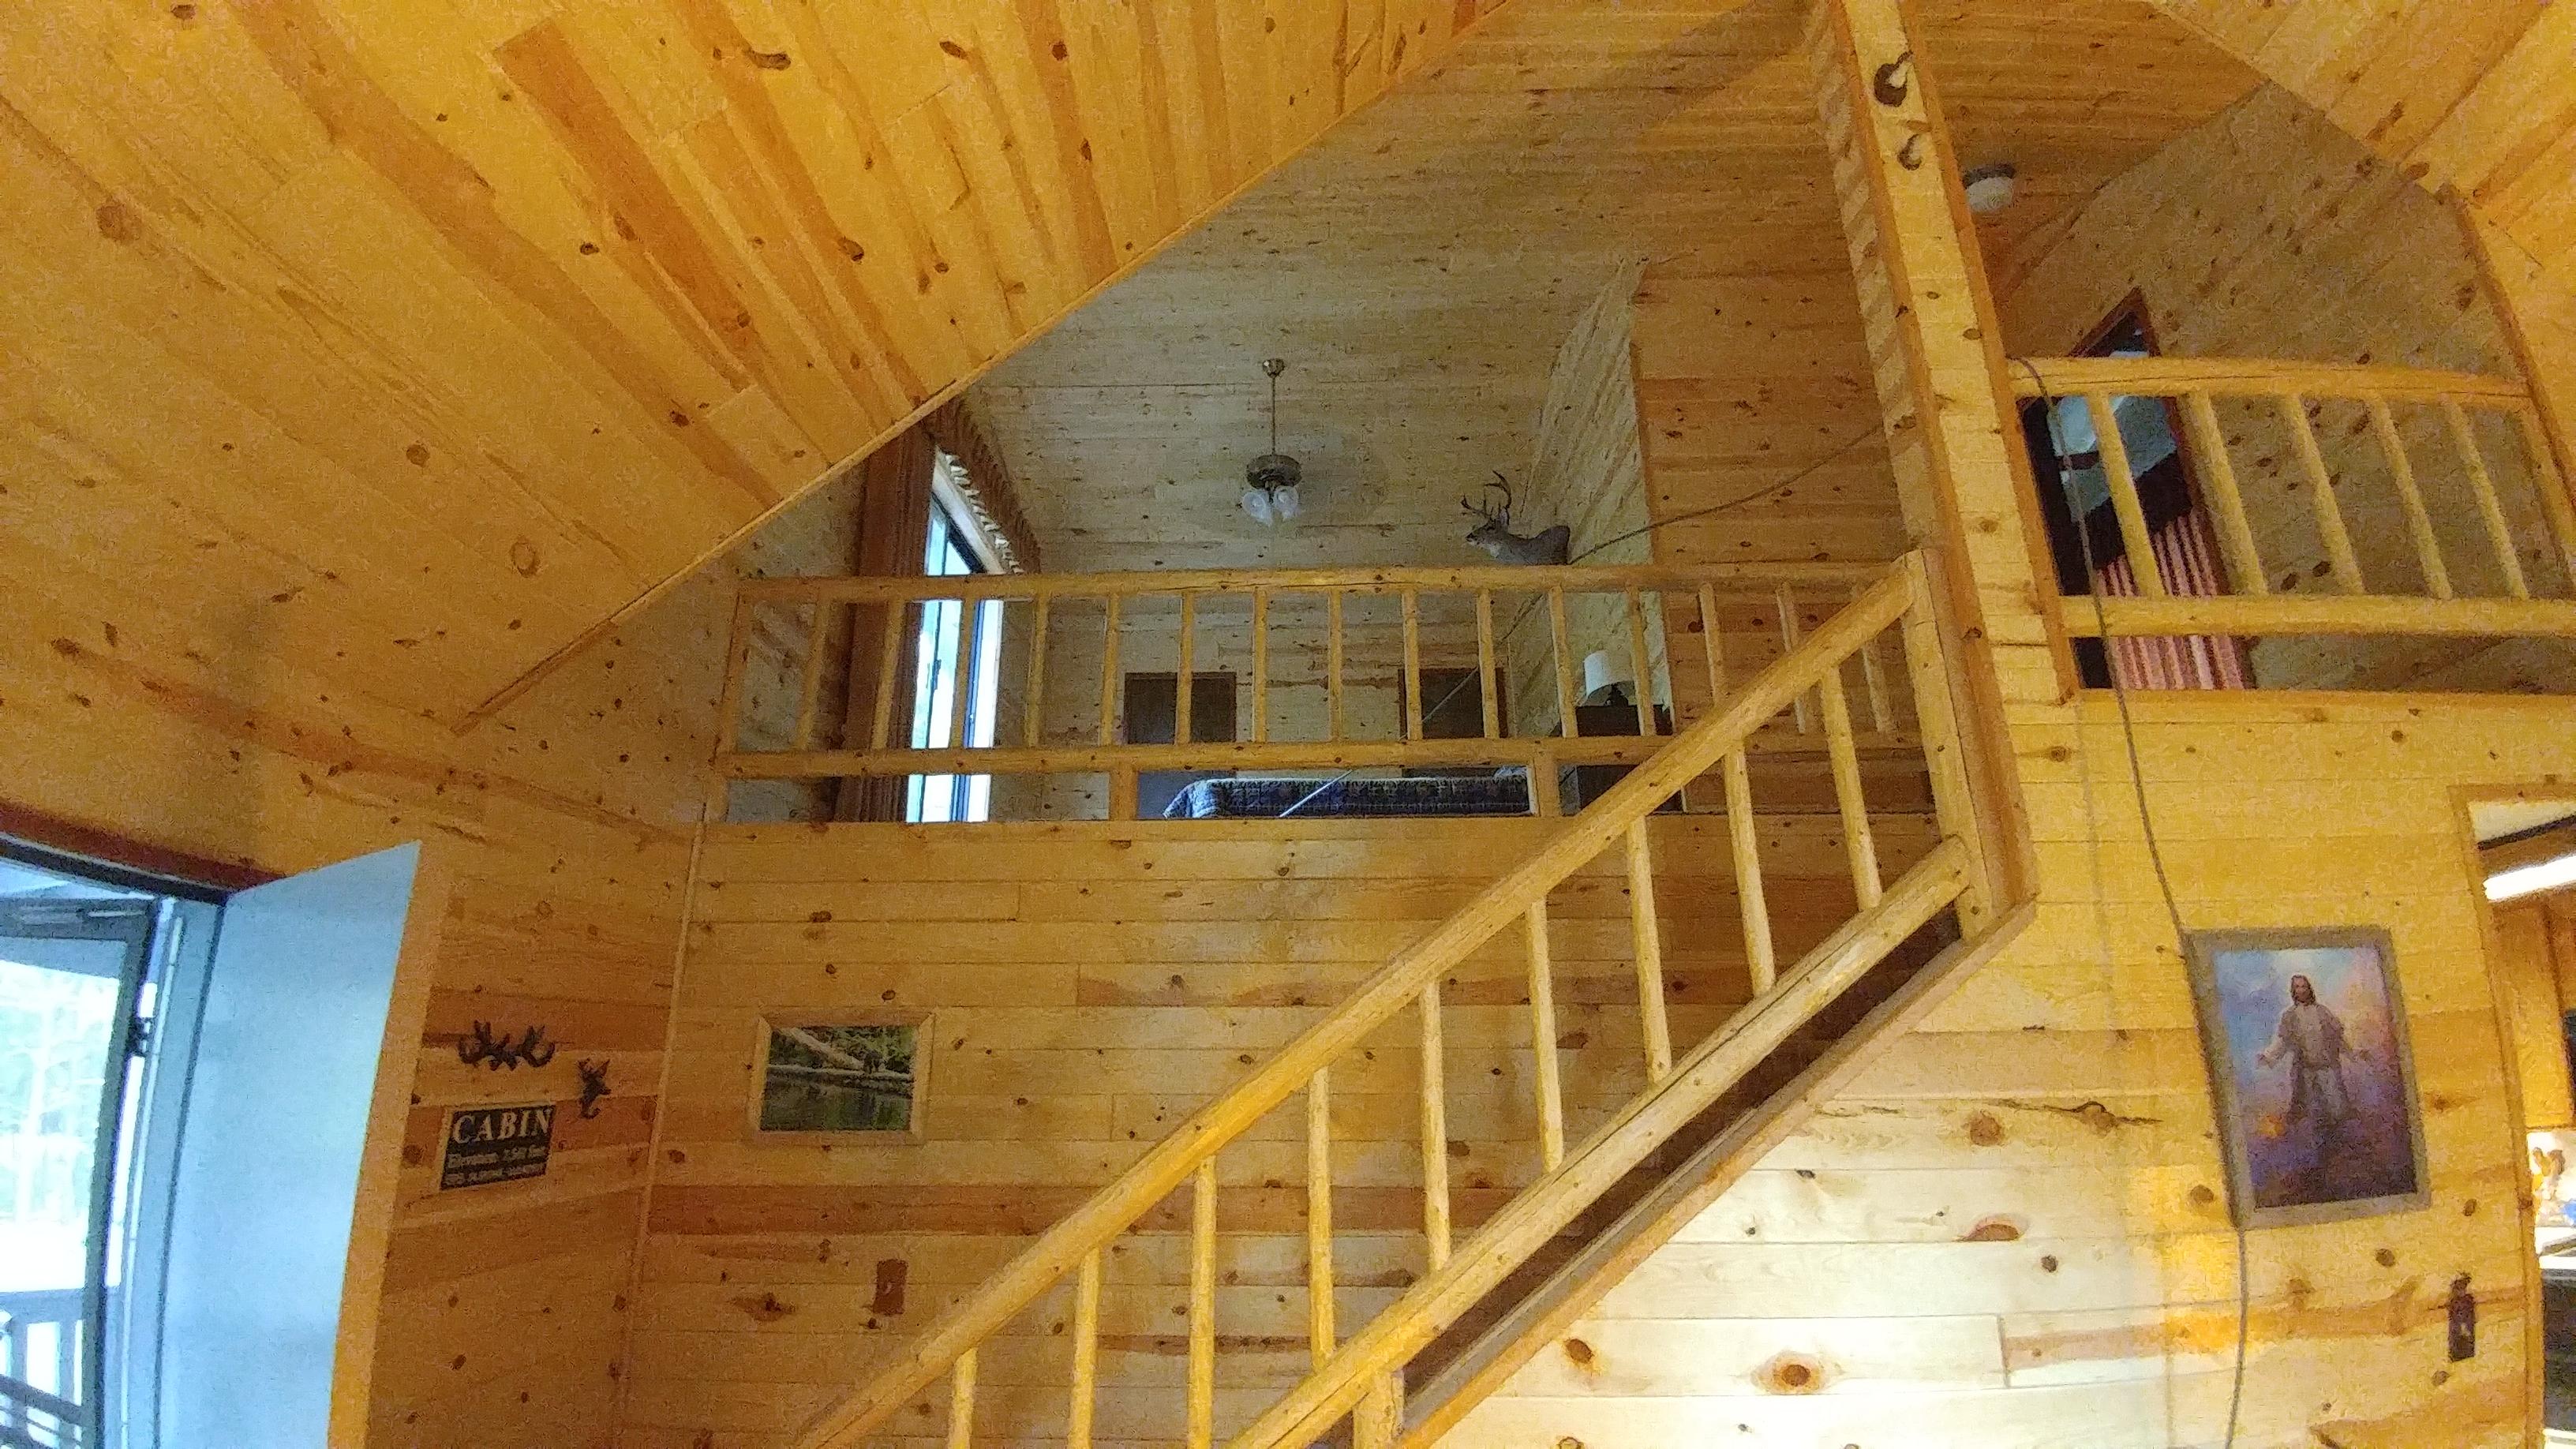 Main Floor Looking into Loft